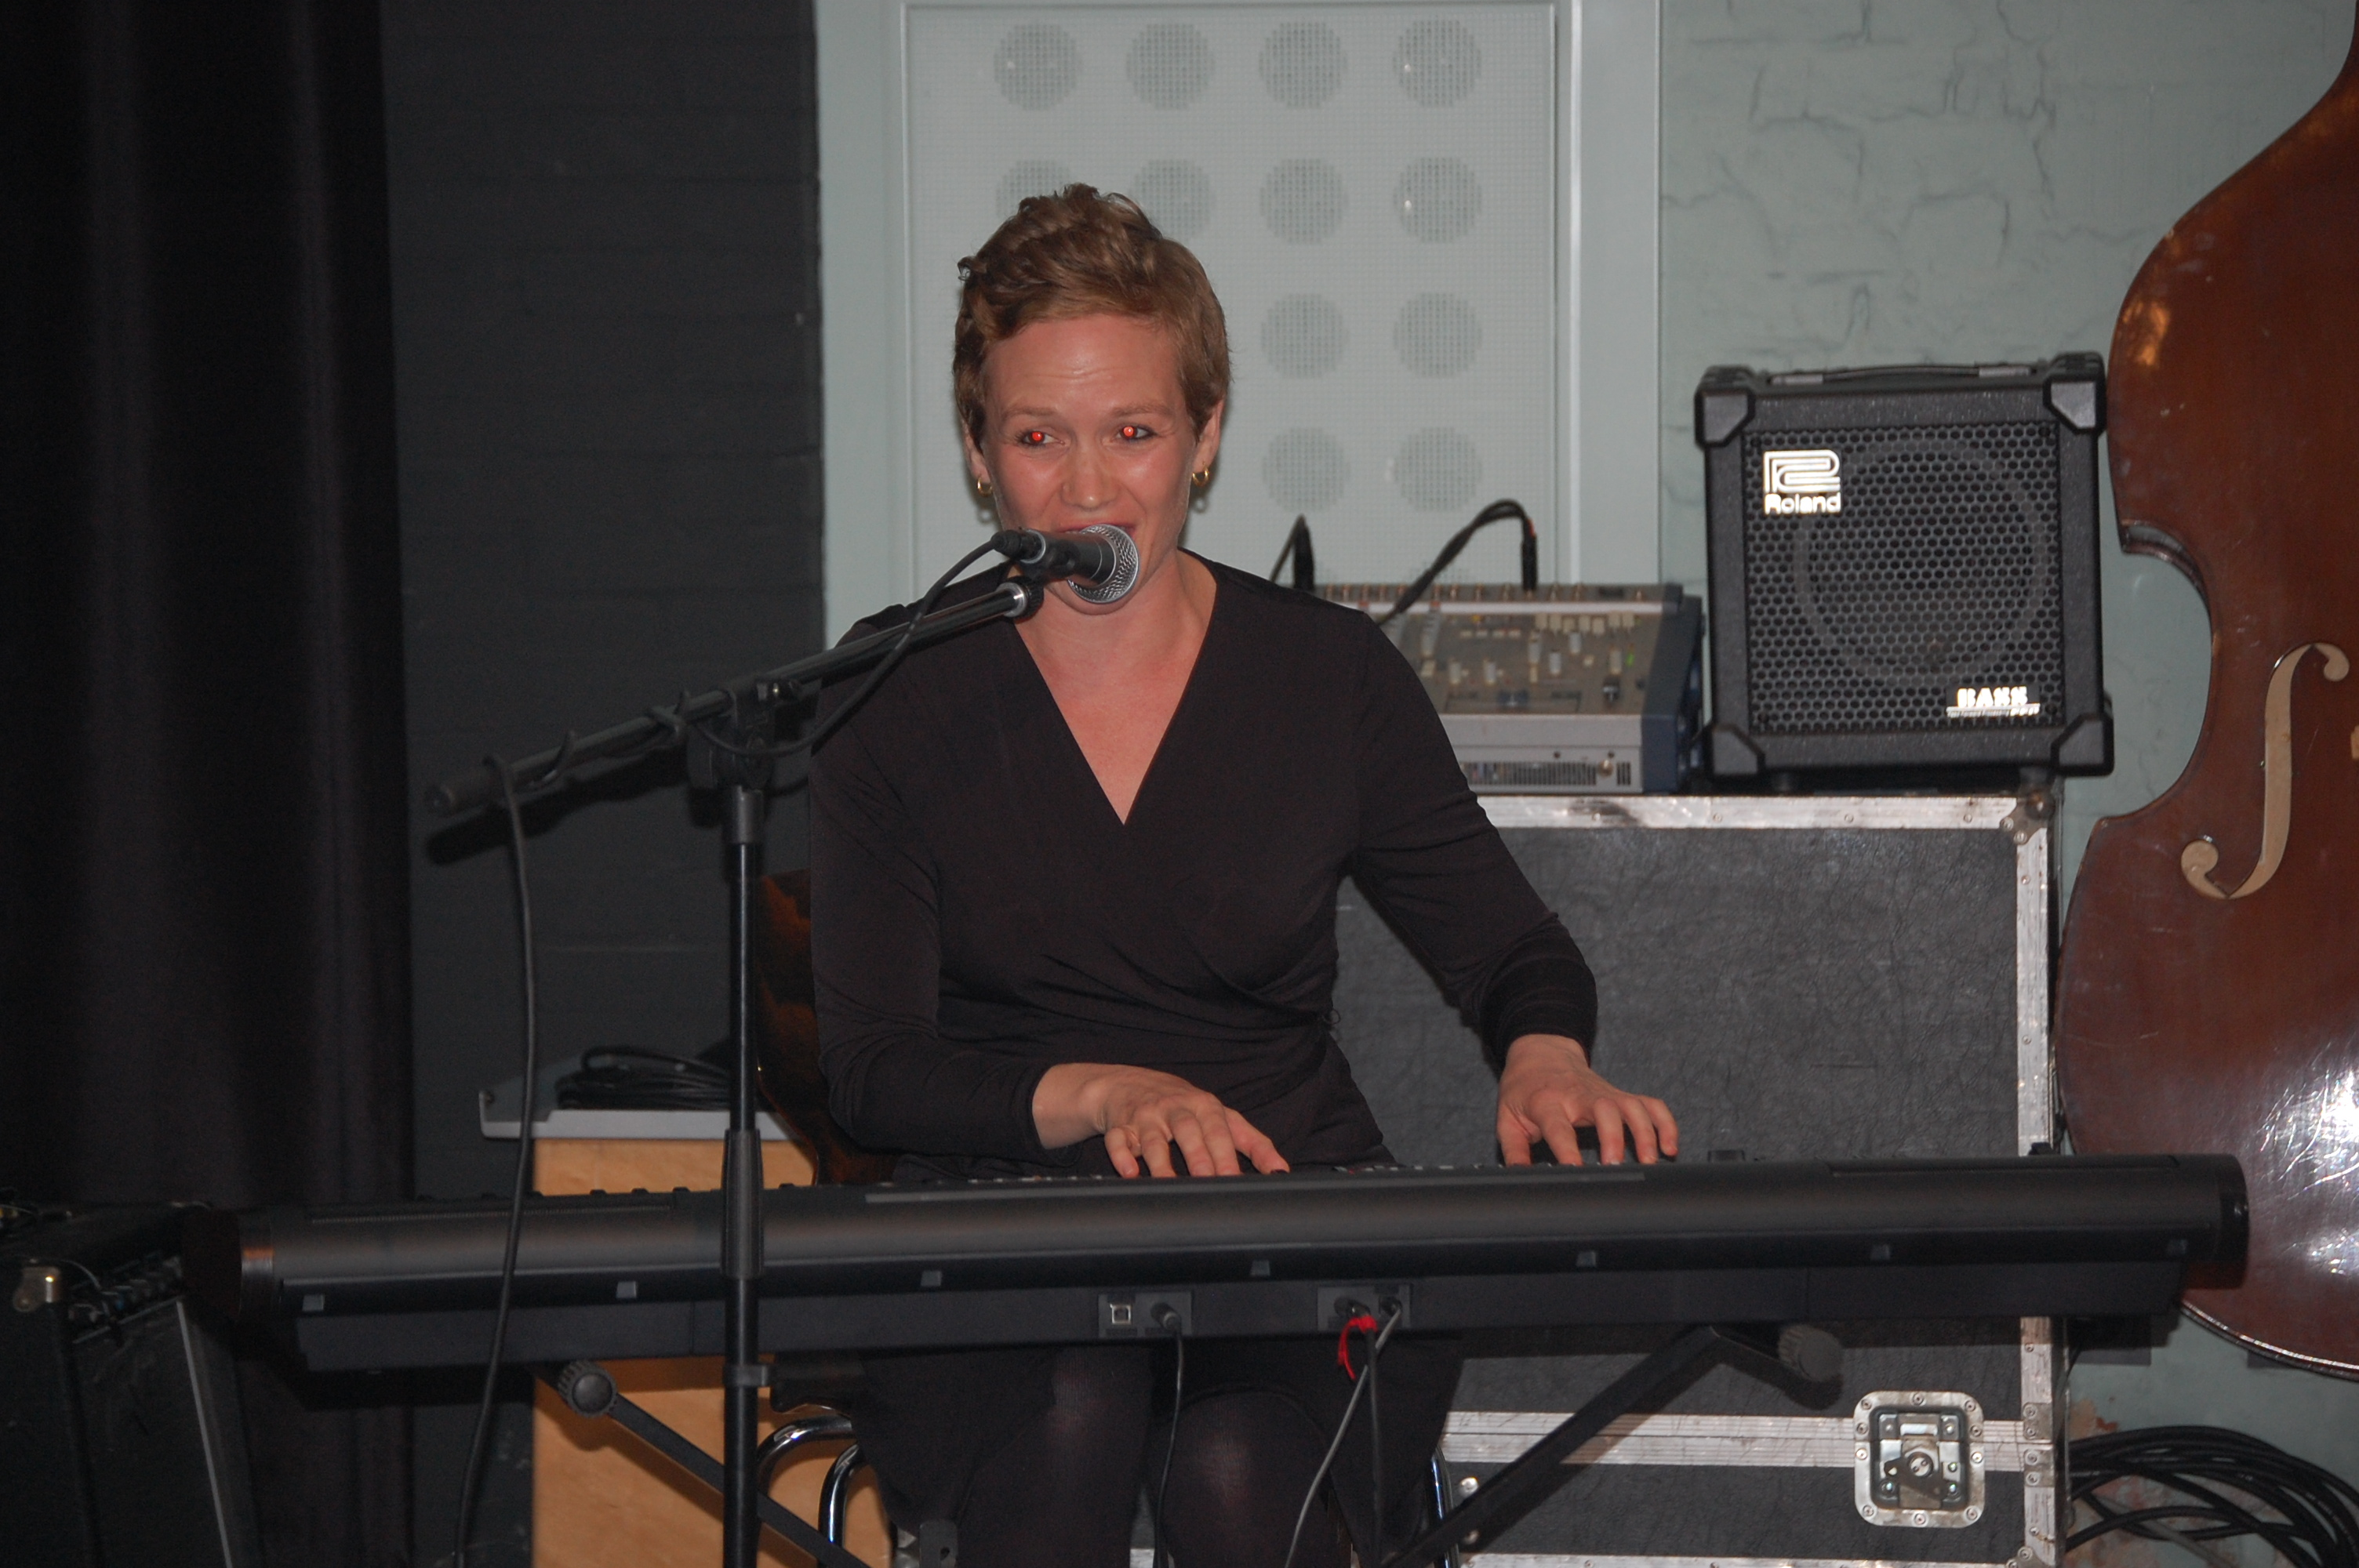 2019-09-21 Konzert Amalia Chikh mosaique LG (6)